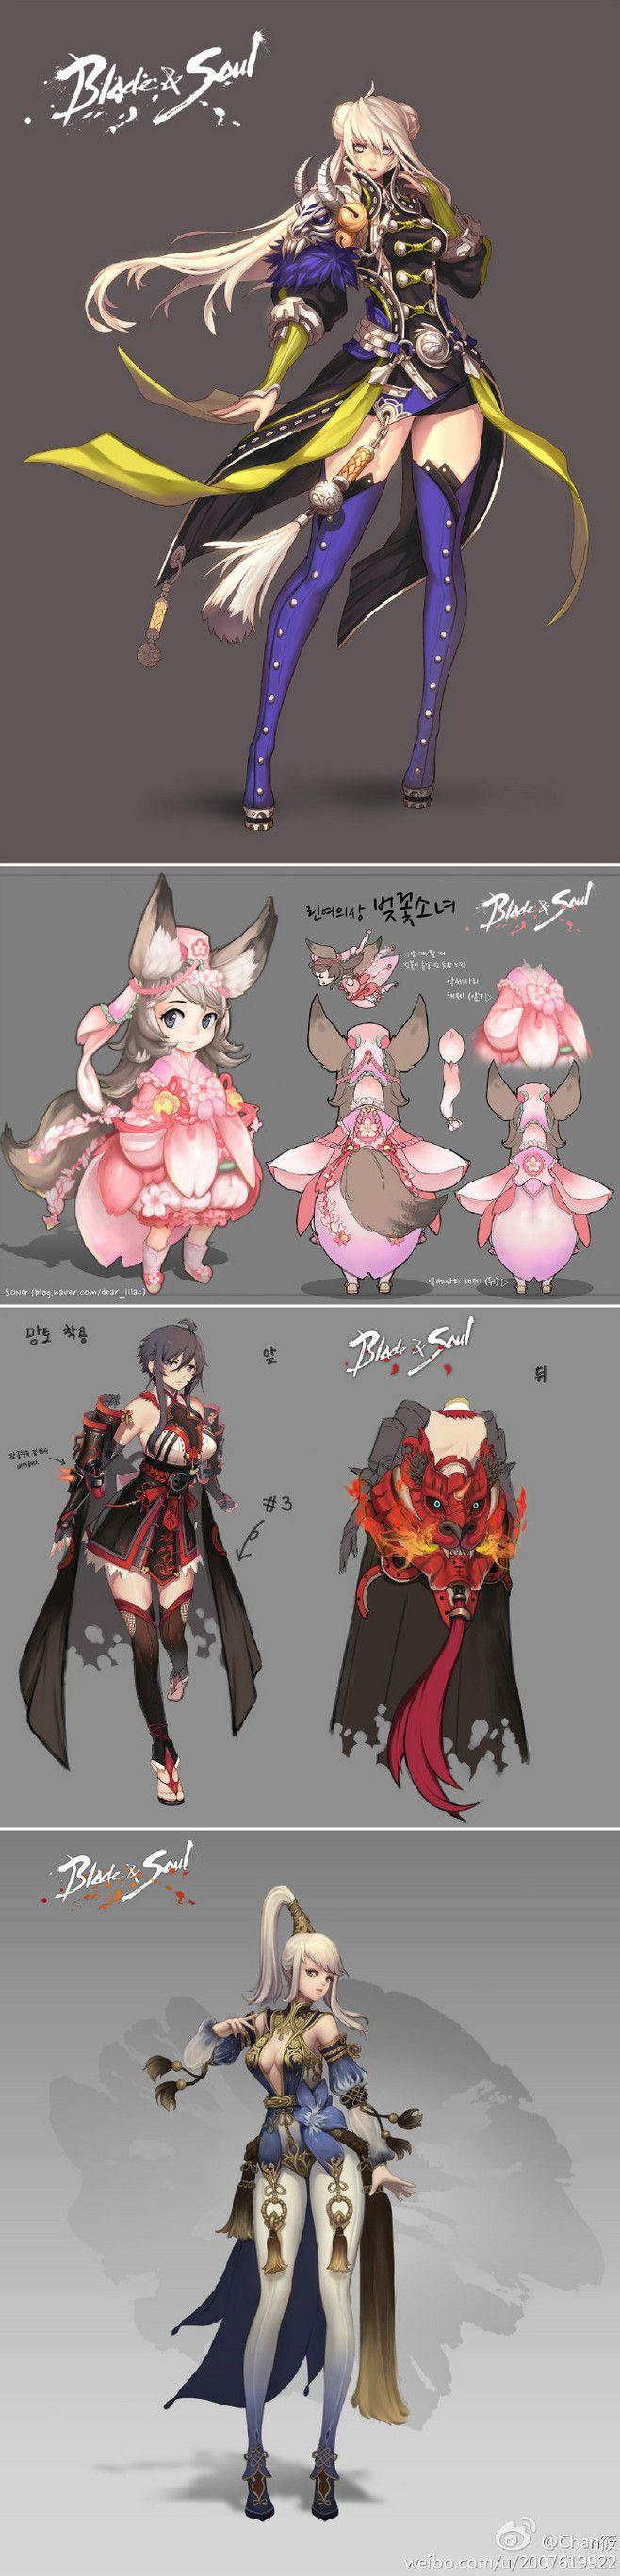 - Ebenezer shine - acquired units (1042 figure) _ petal Games